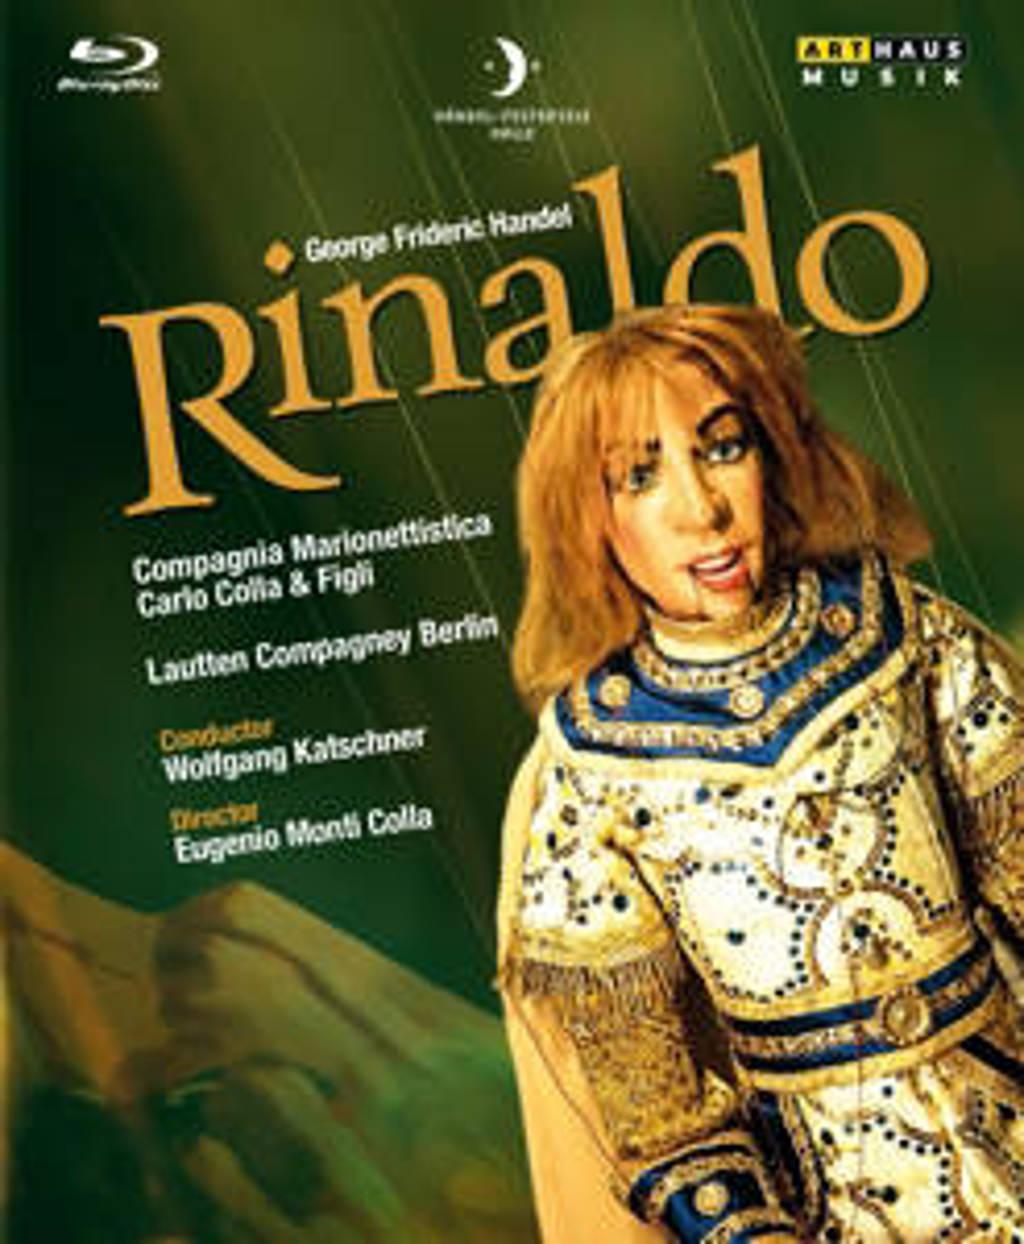 Giovannini,Geier,Schoder - Rinaldo, Ludwigsburg Palace Theatre (Blu-ray)